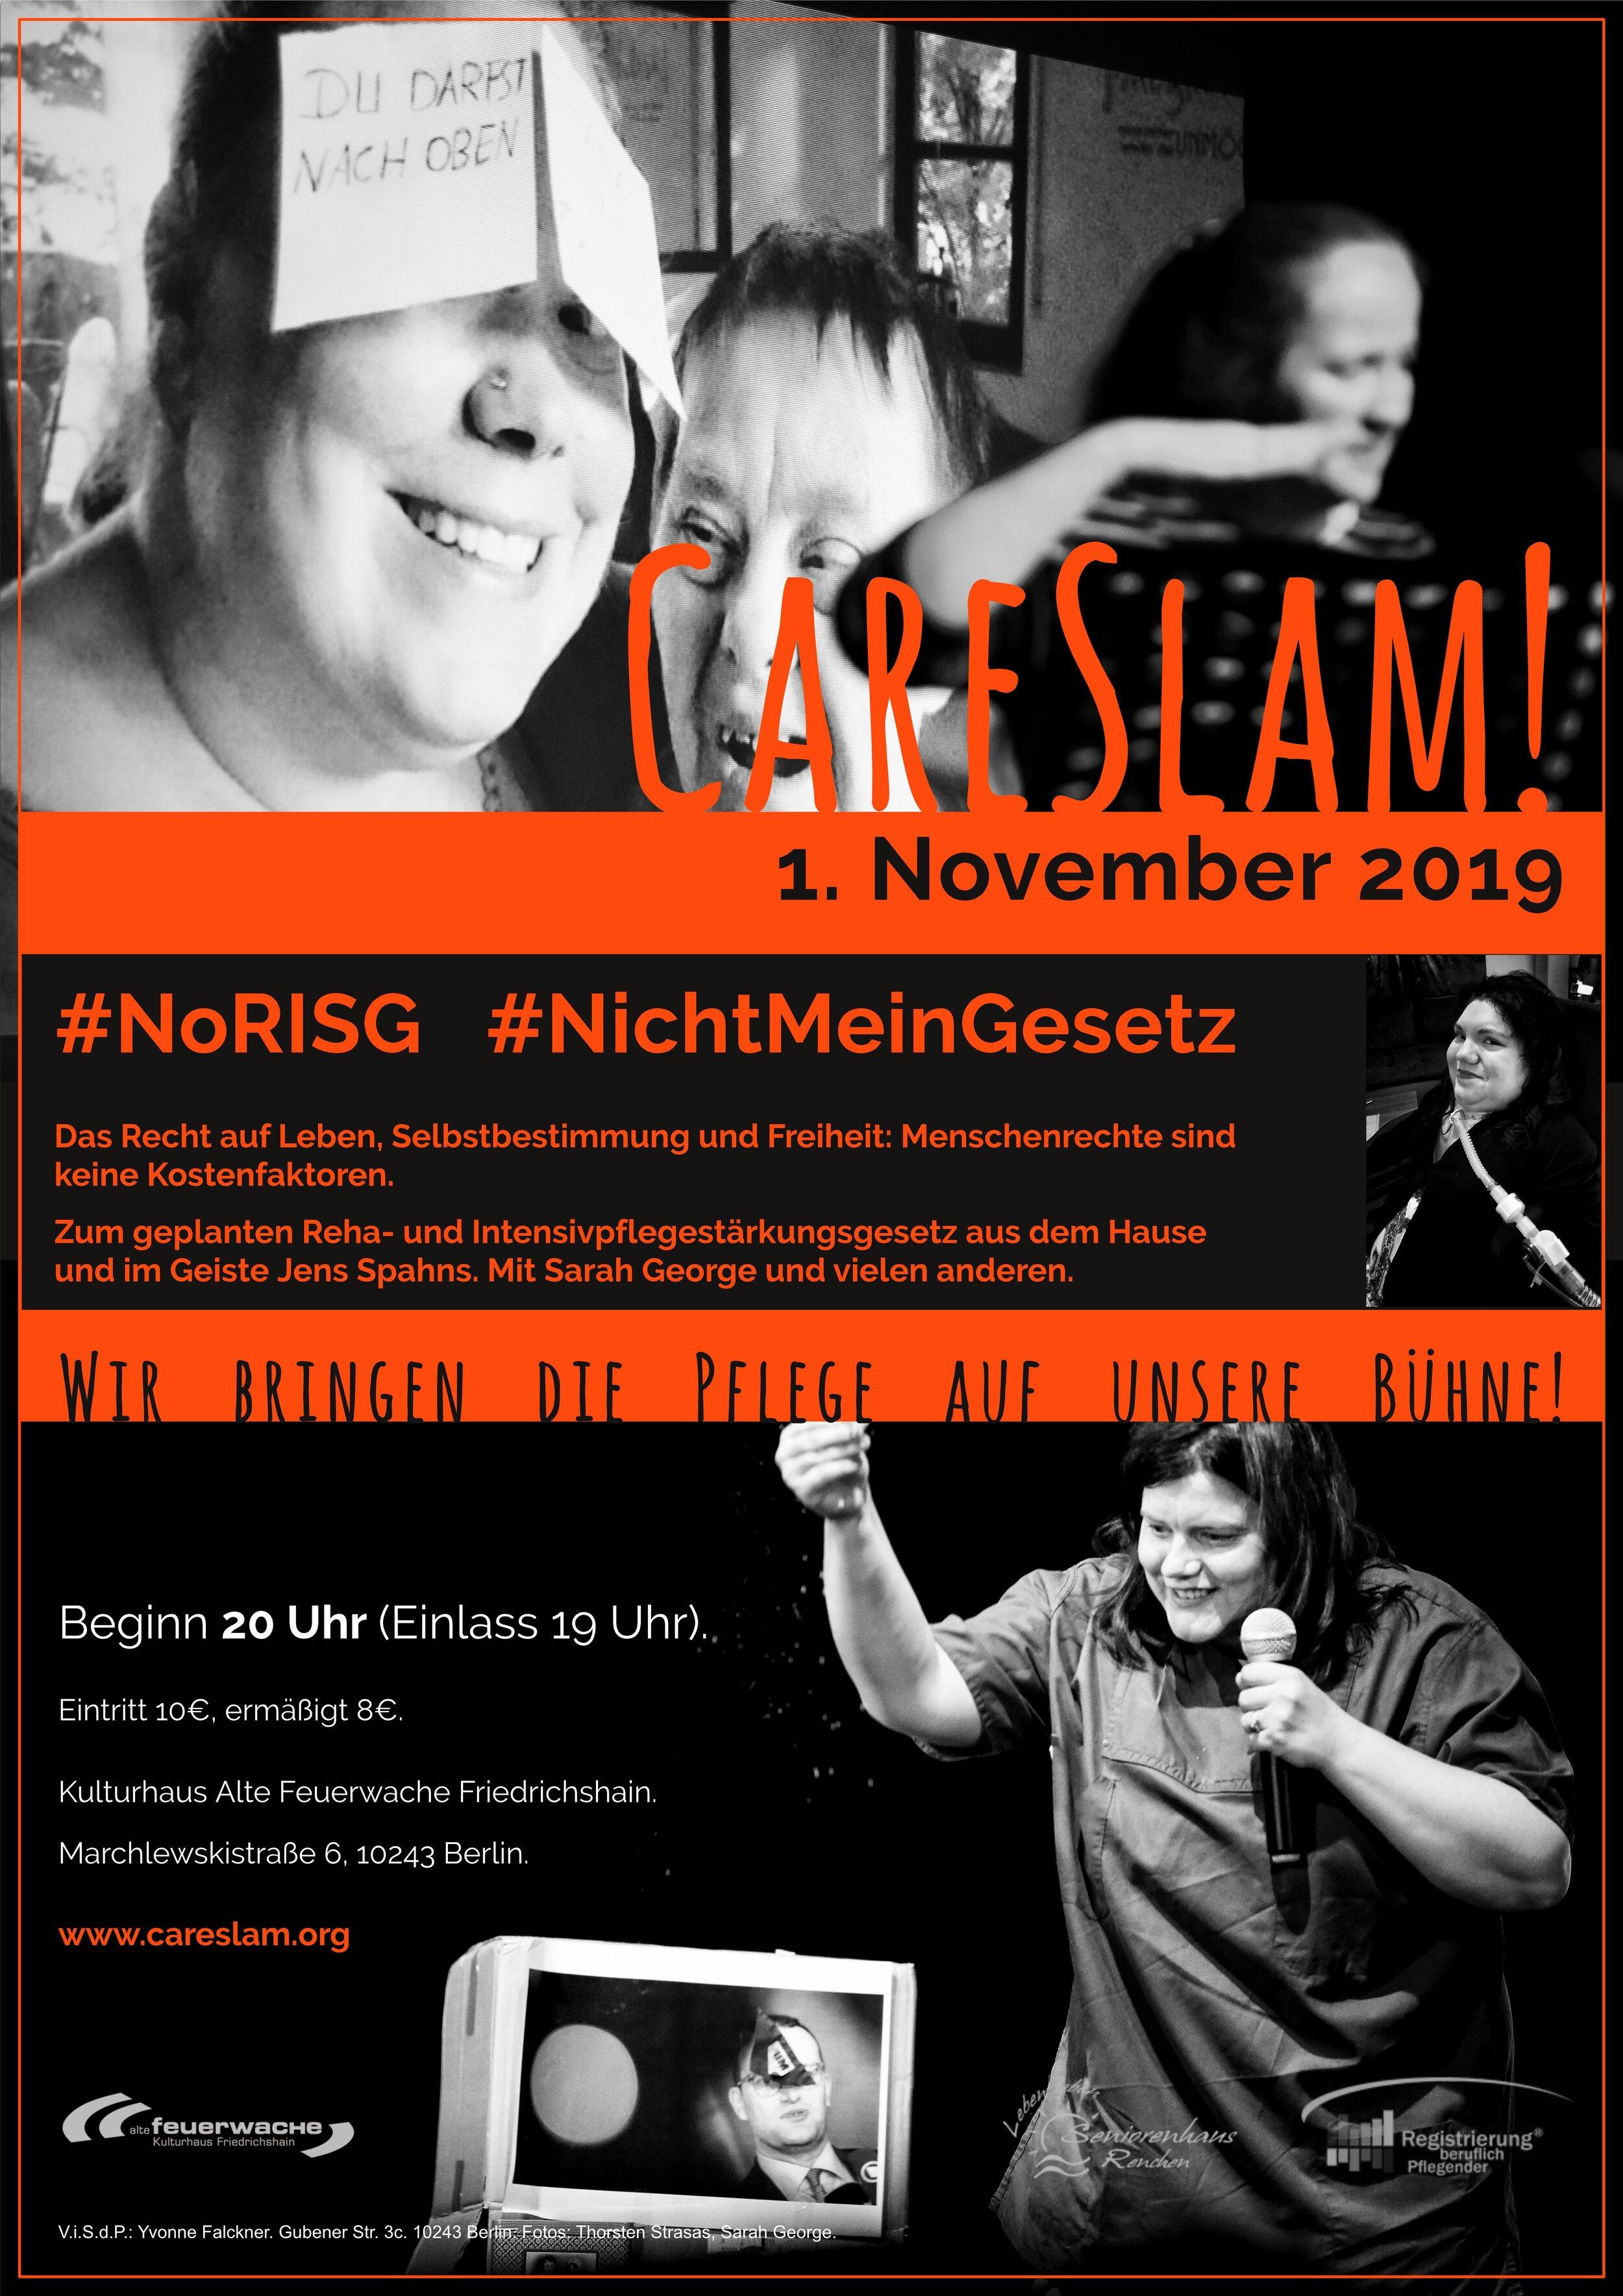 Download Plakat zum CareSlam!12. JPG [4,0MB].